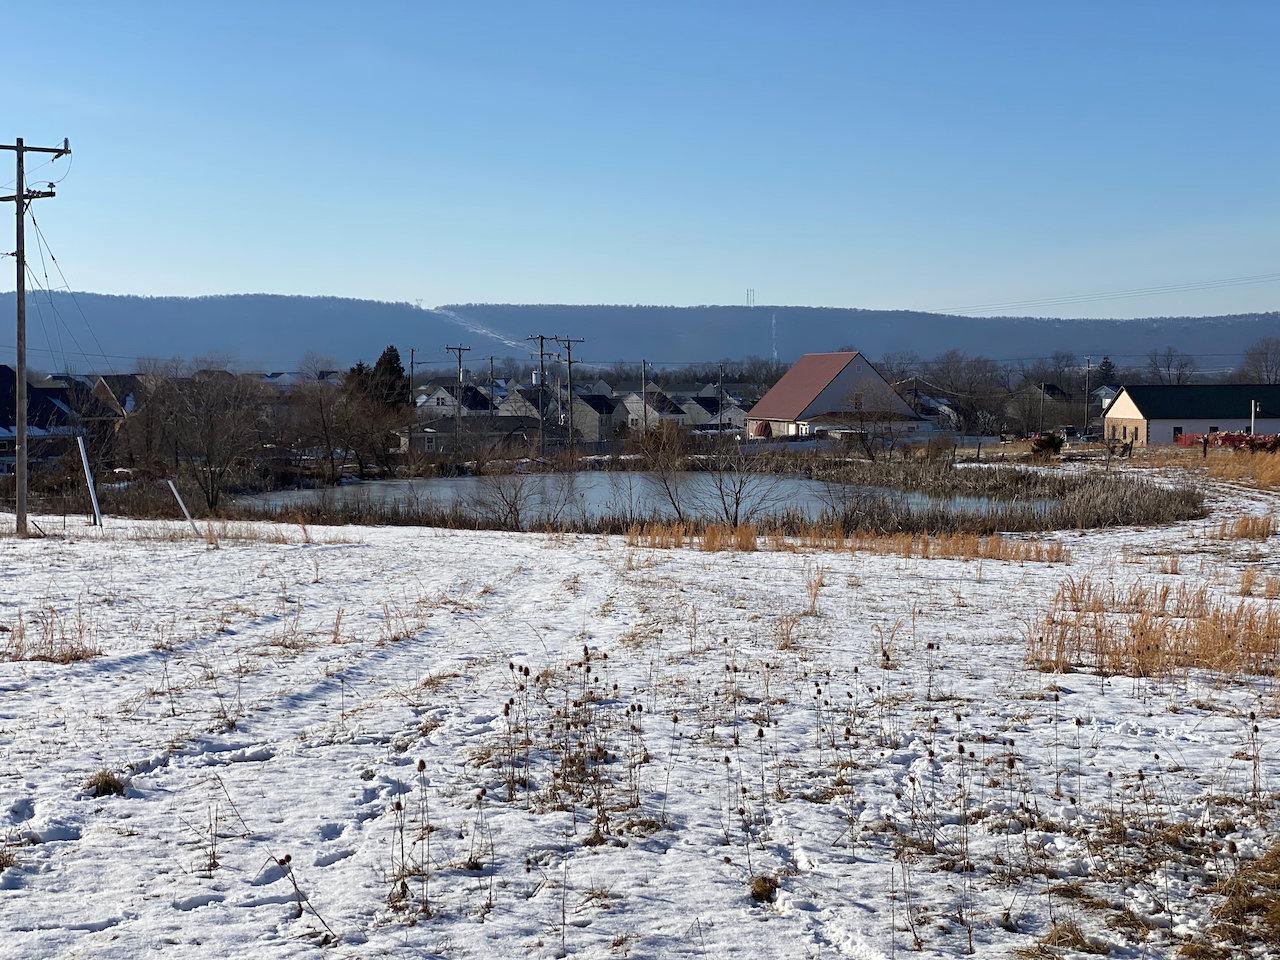 Image for 35 +/- Acres Zoned C-2 & CI-1 in Loudoun County, VA